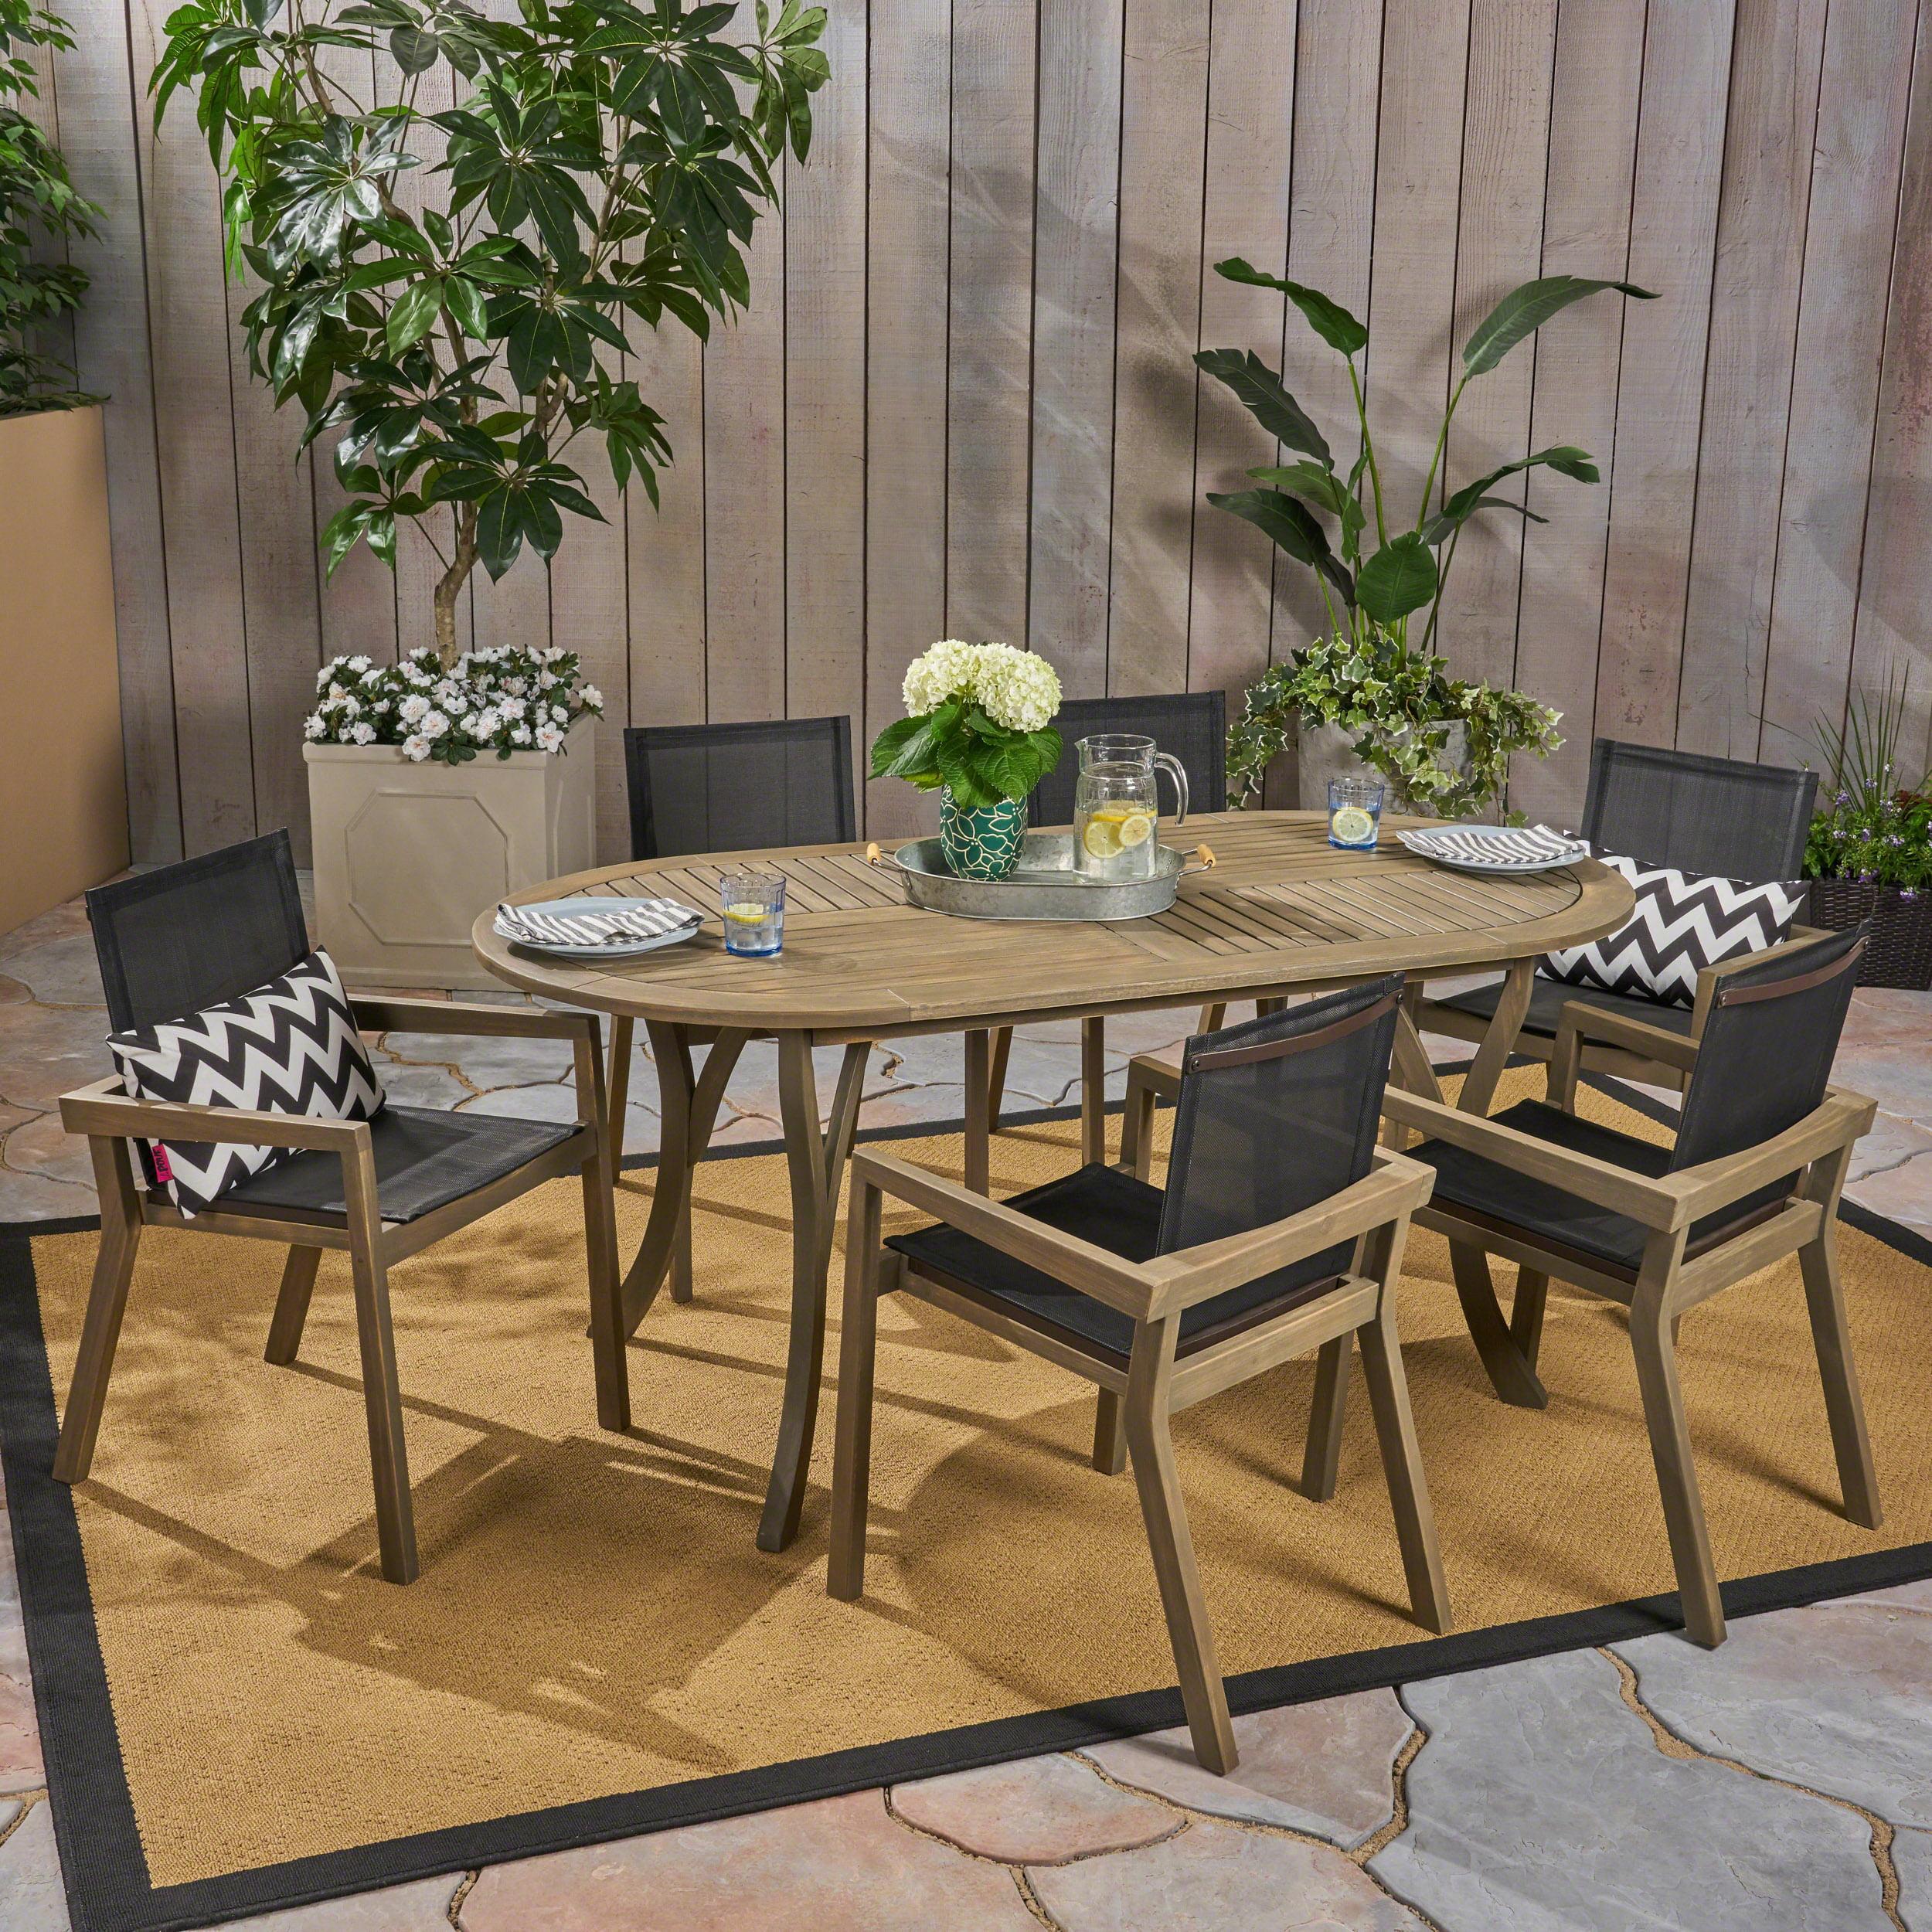 Kalani Outdoor 7 Piece Acacia Wood and Mesh Oval Dining Set, Gray, Black